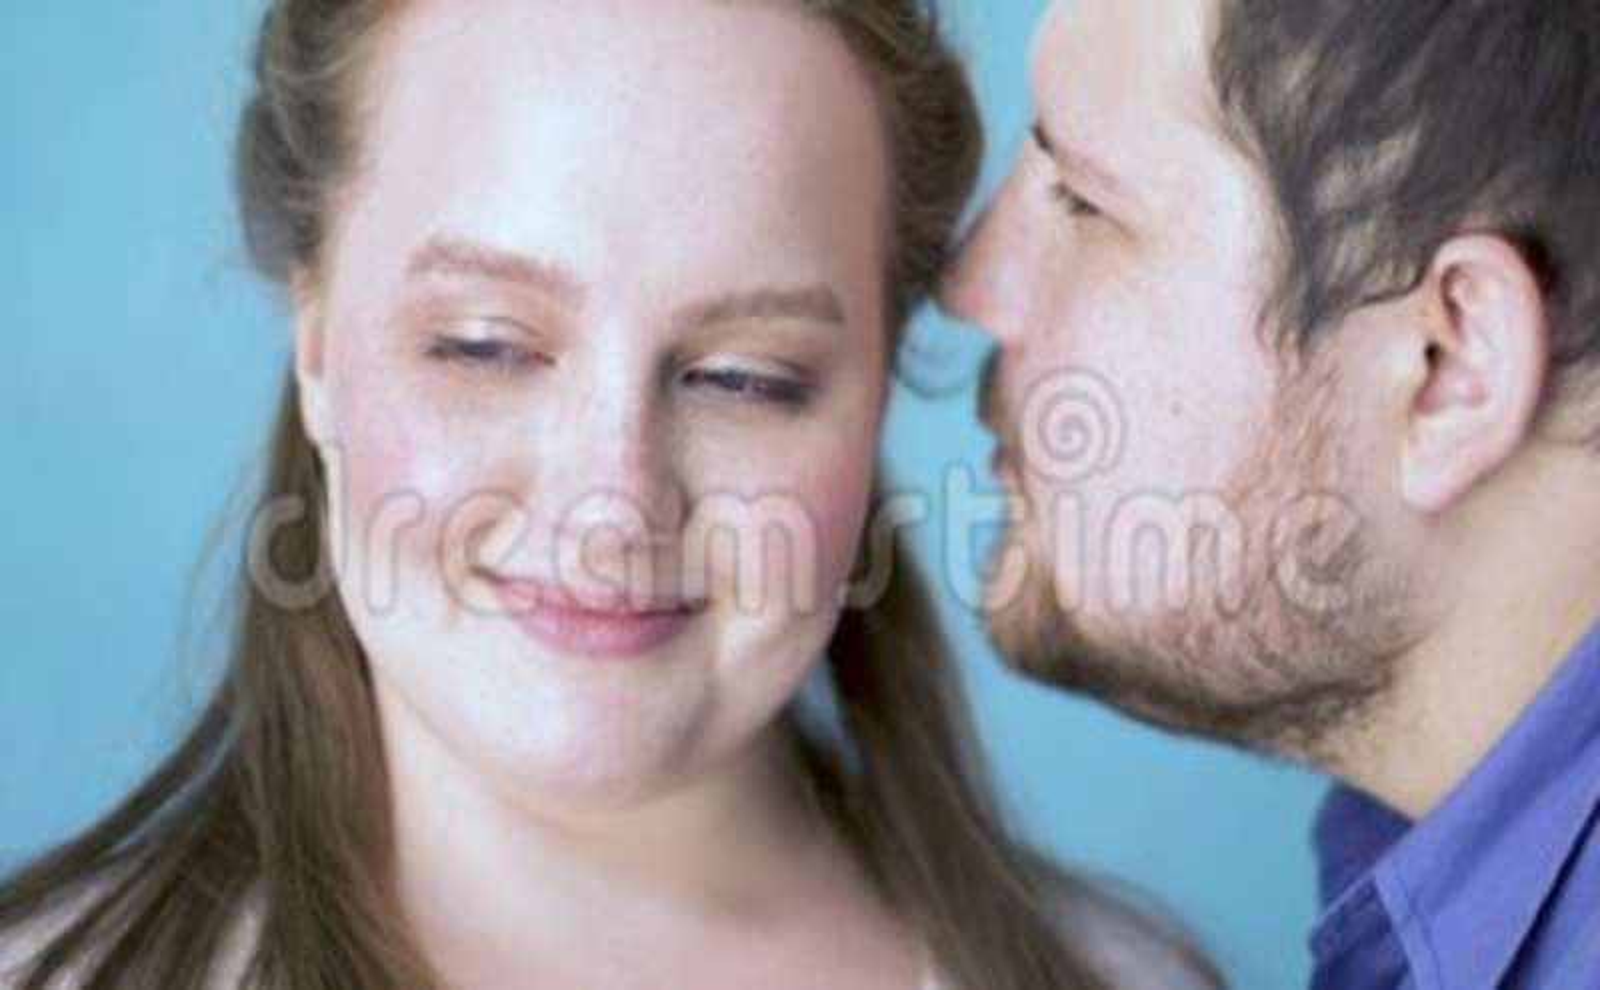 Taurus woman dating an aries man